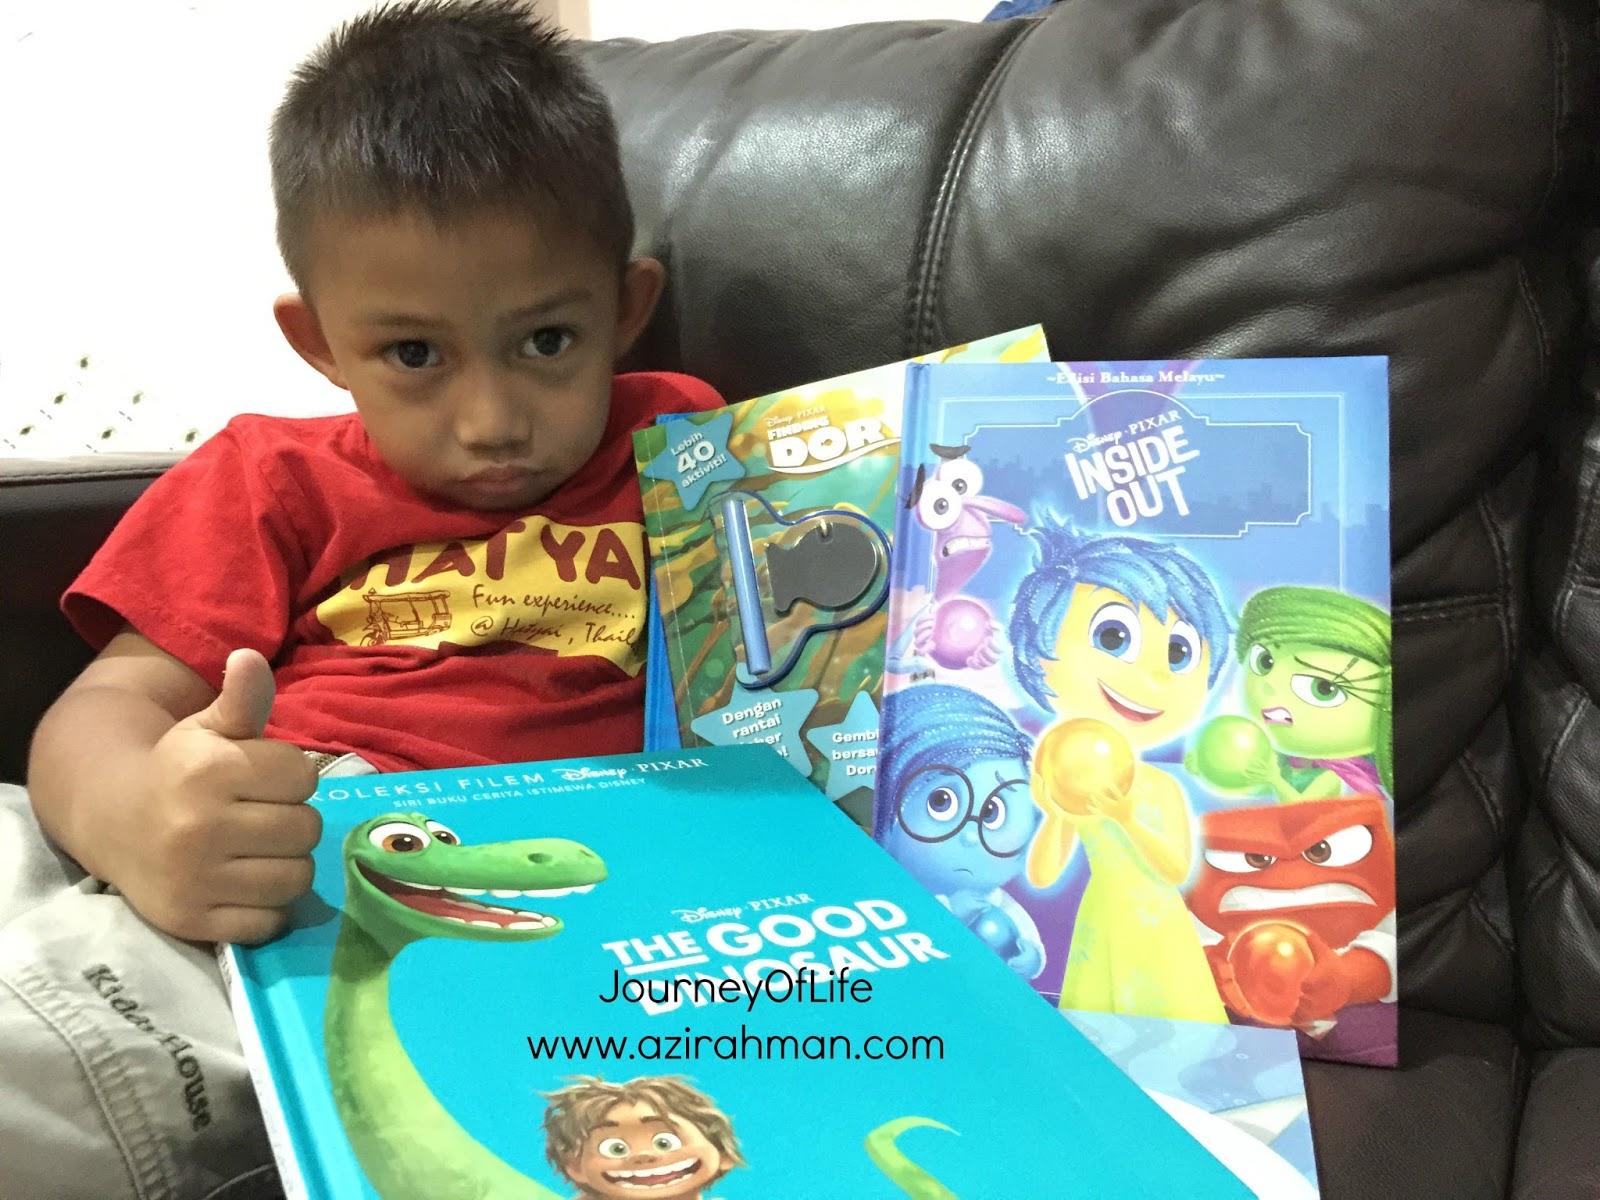 buku disney , mari baca, popular , advantage quest , buku anak-anak , peraduan Disneyland Hong Kong